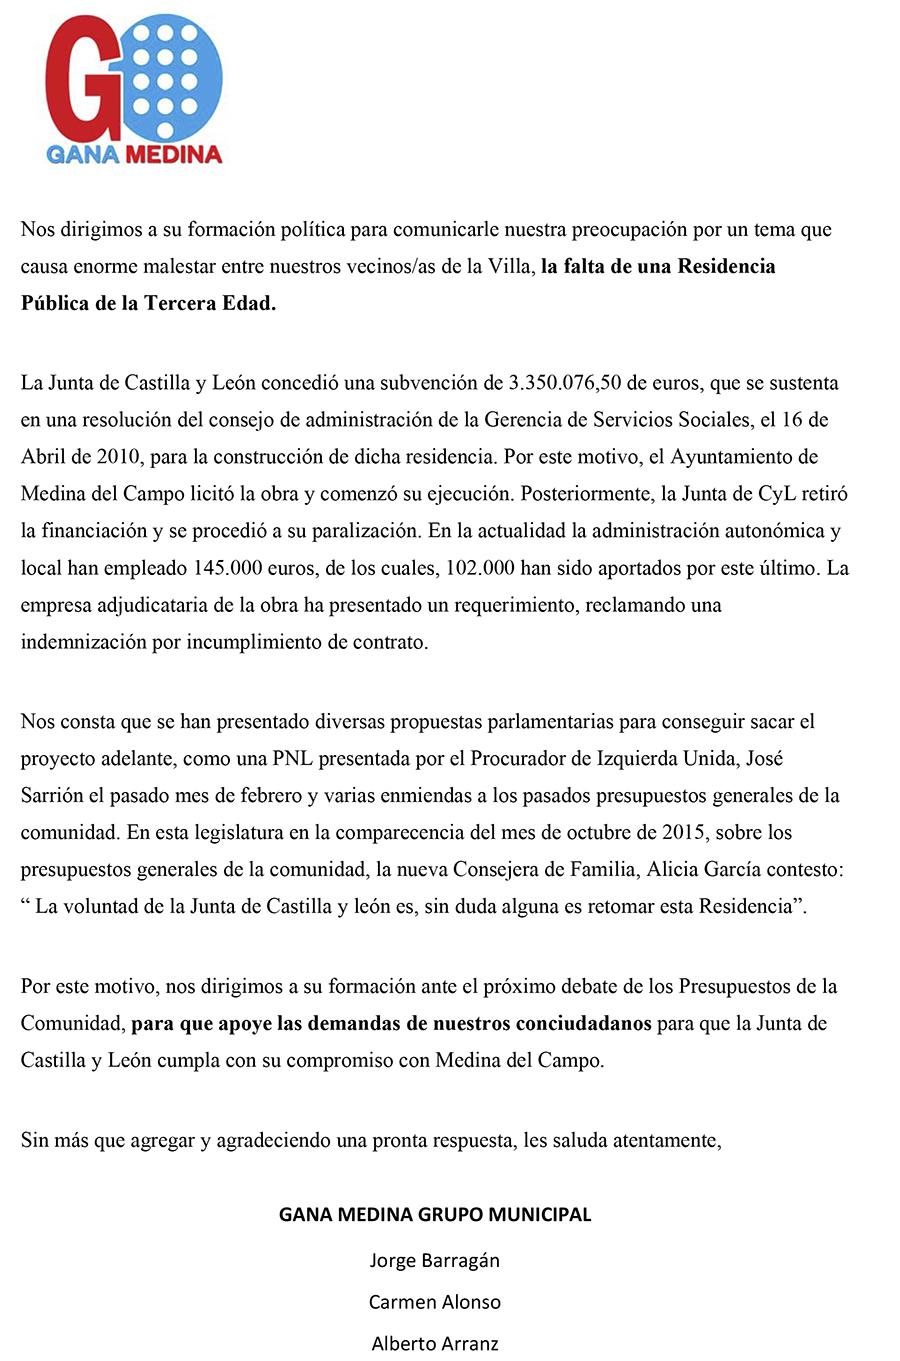 Microsoft Word - 16_11_03_Cartasobreresidencia.docx